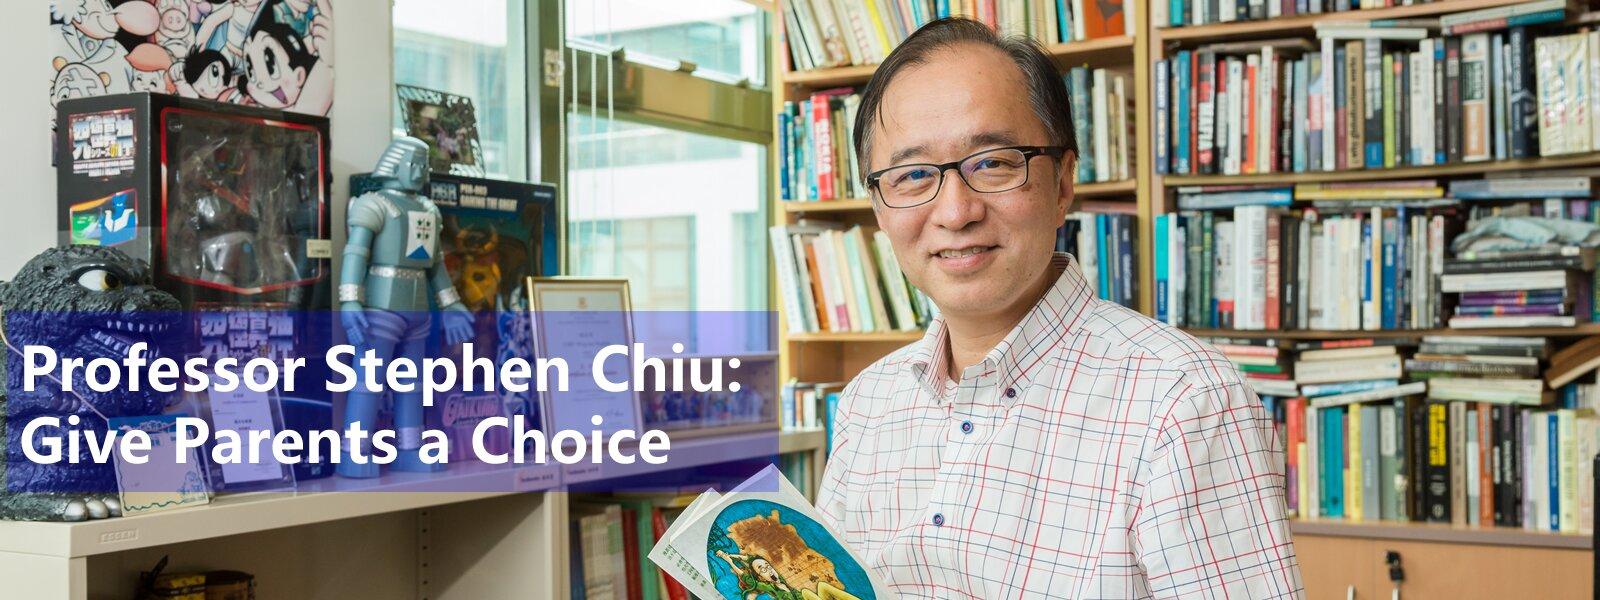 Professor Stephen Chiu Wing-kai: Give Parents a Choice